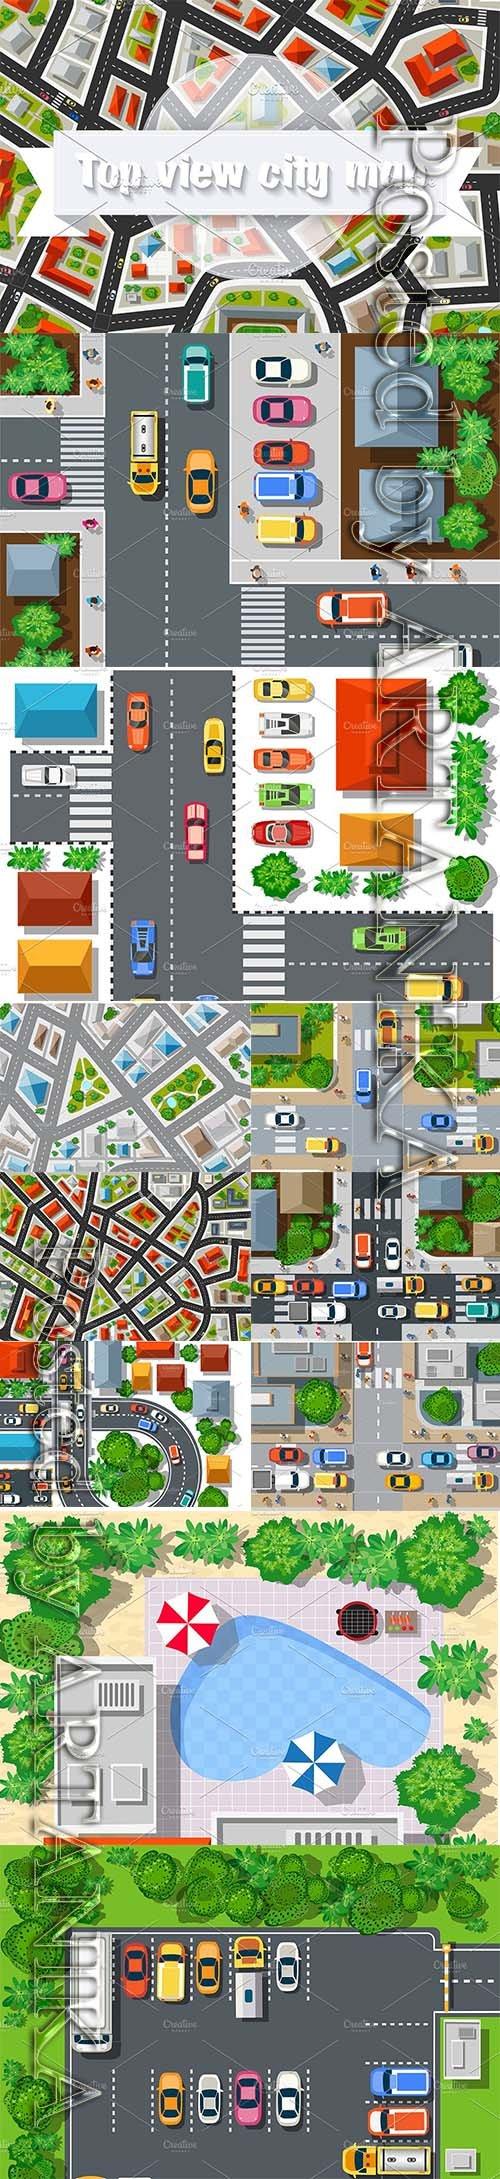 CreativeMarket - City top view Bundle map city 1121360